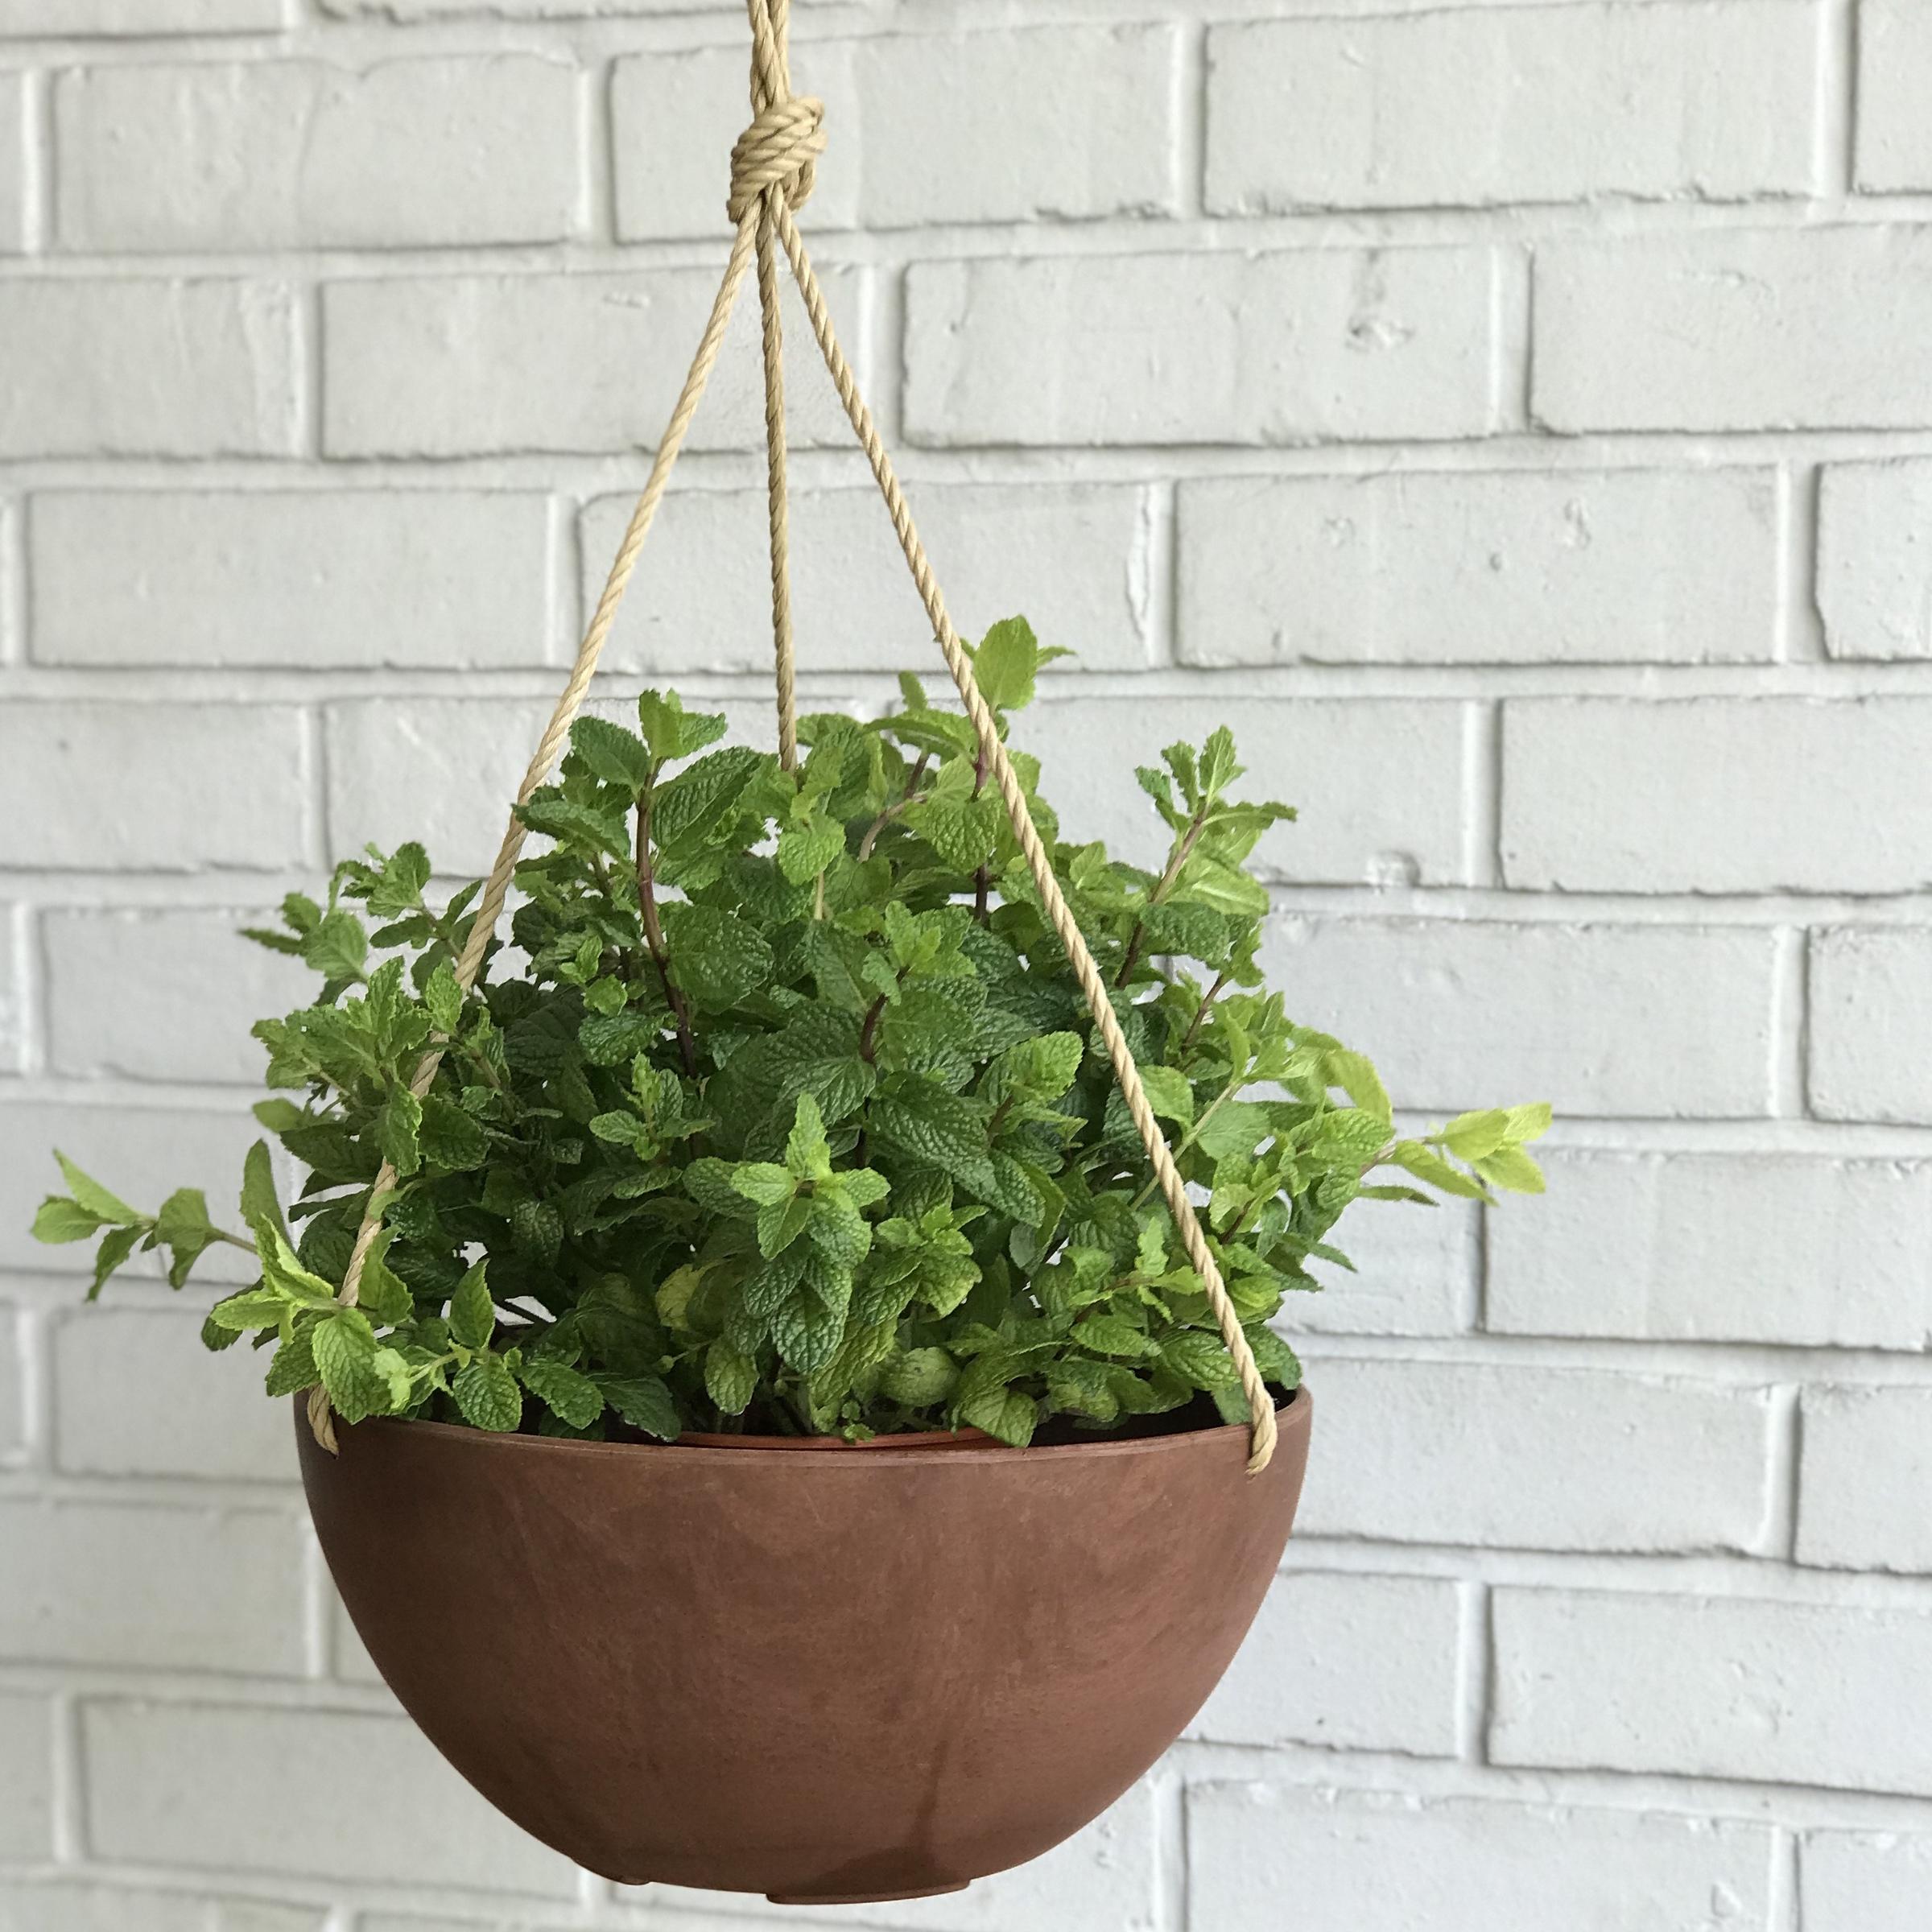 Hanging Planter - Bronze M with Plants 3754.jpg